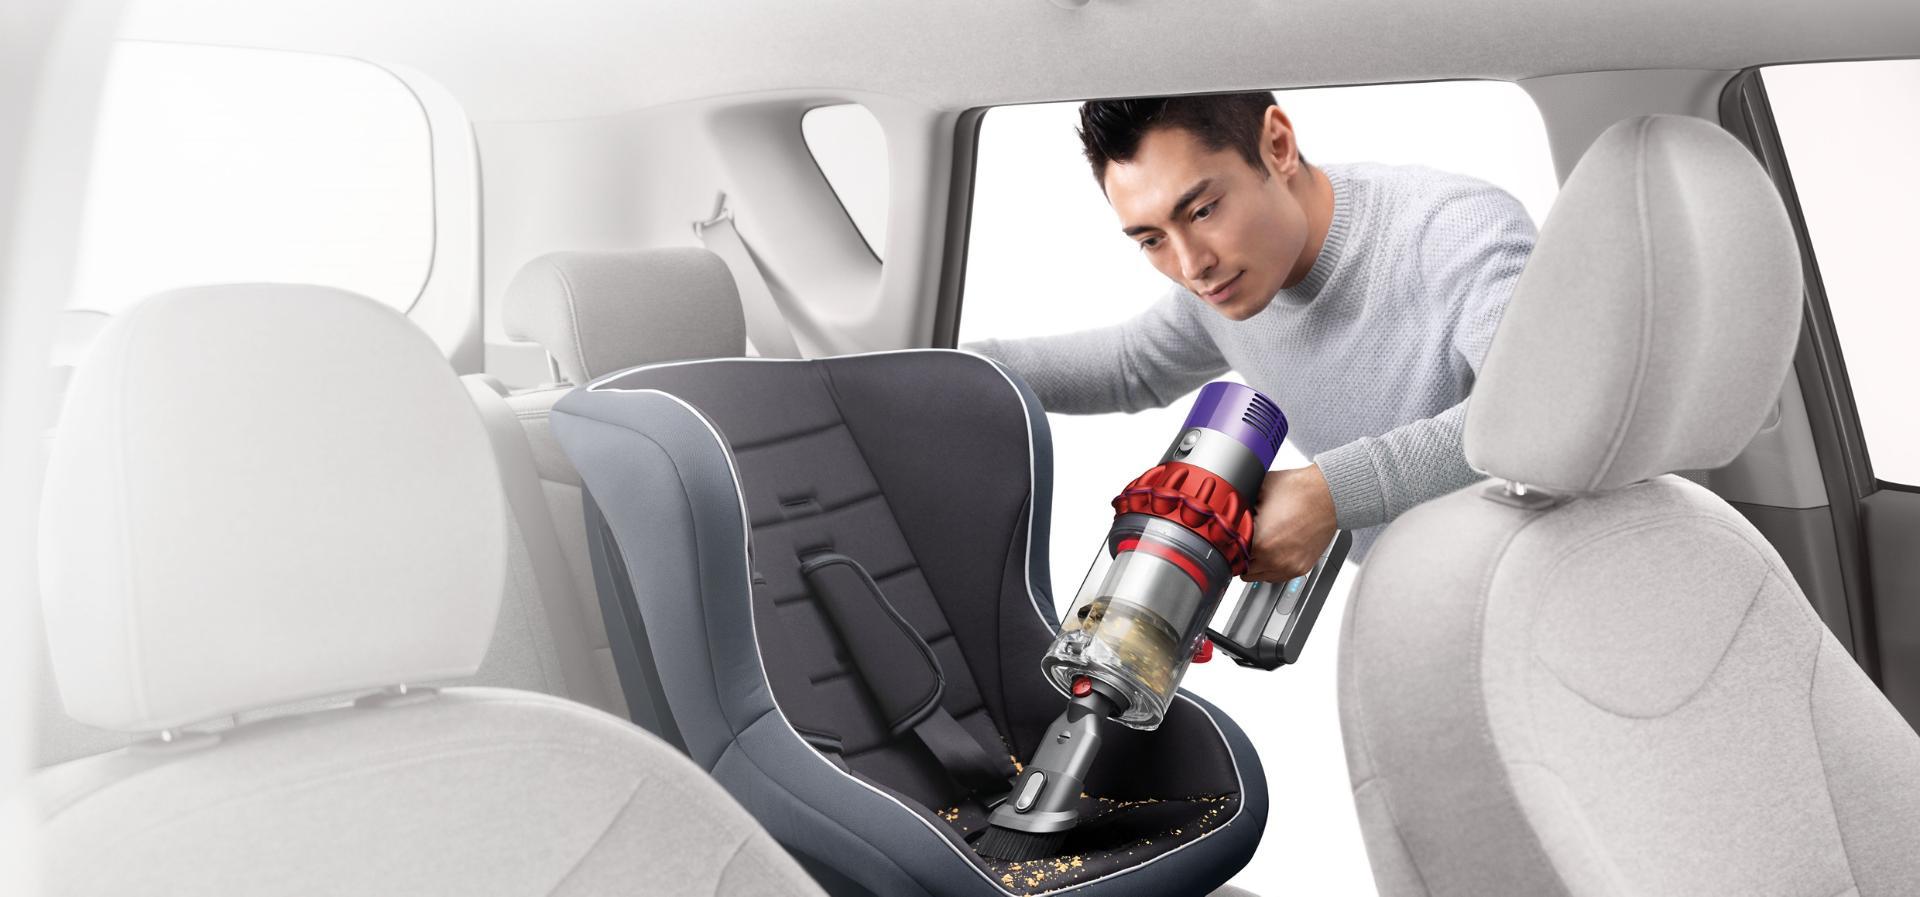 Dyson Cyclone V10™ 吸塵機於手提式下清潔車廂內部